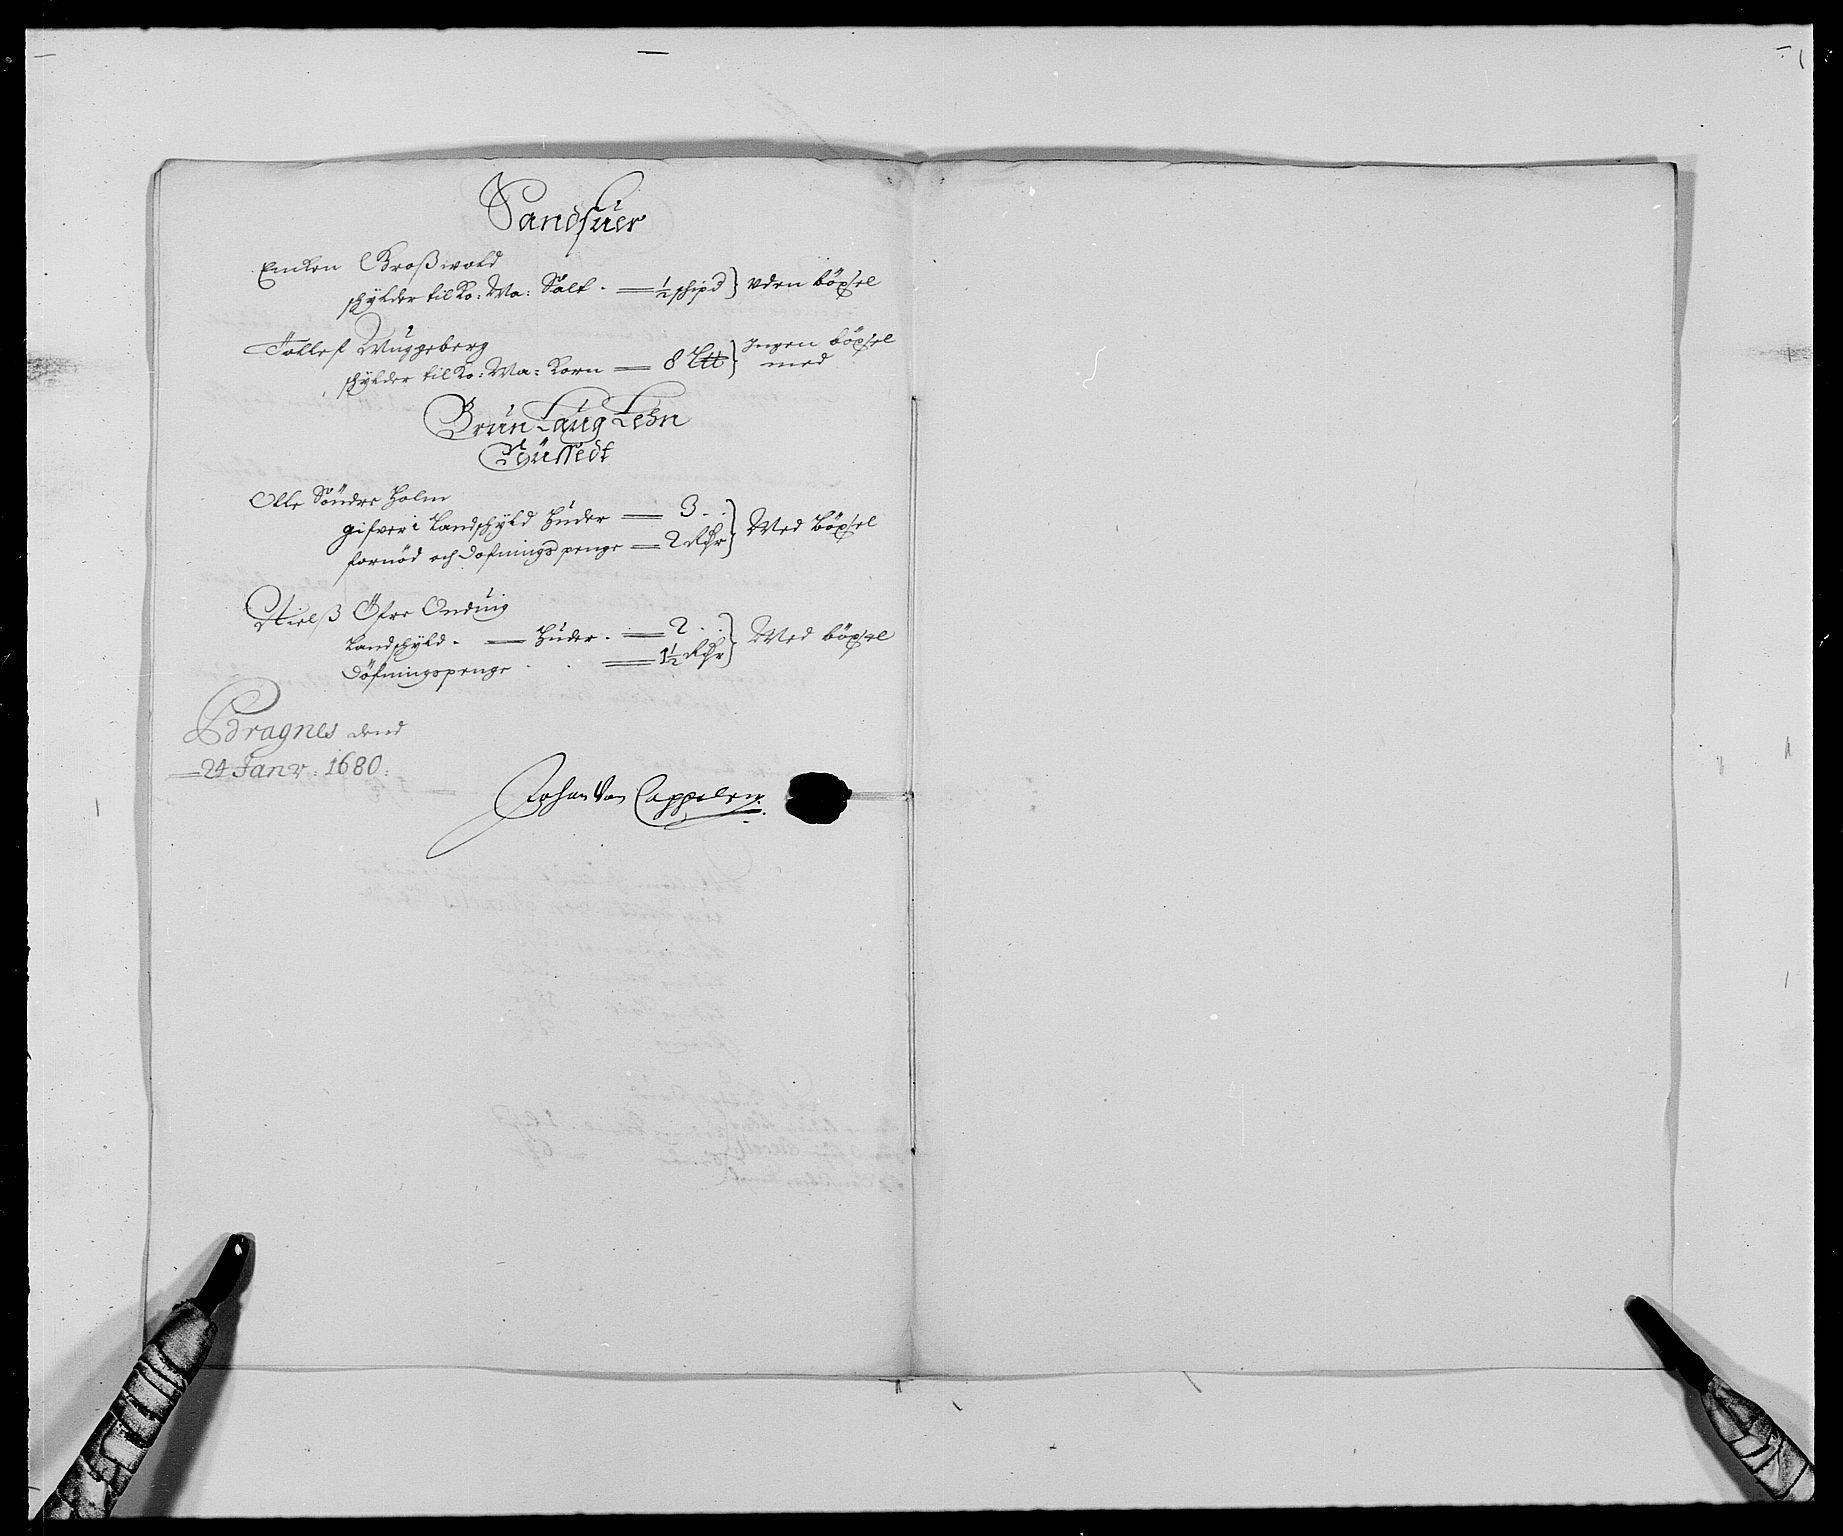 RA, Rentekammeret inntil 1814, Reviderte regnskaper, Fogderegnskap, R27/L1686: Fogderegnskap Lier, 1678-1686, s. 140